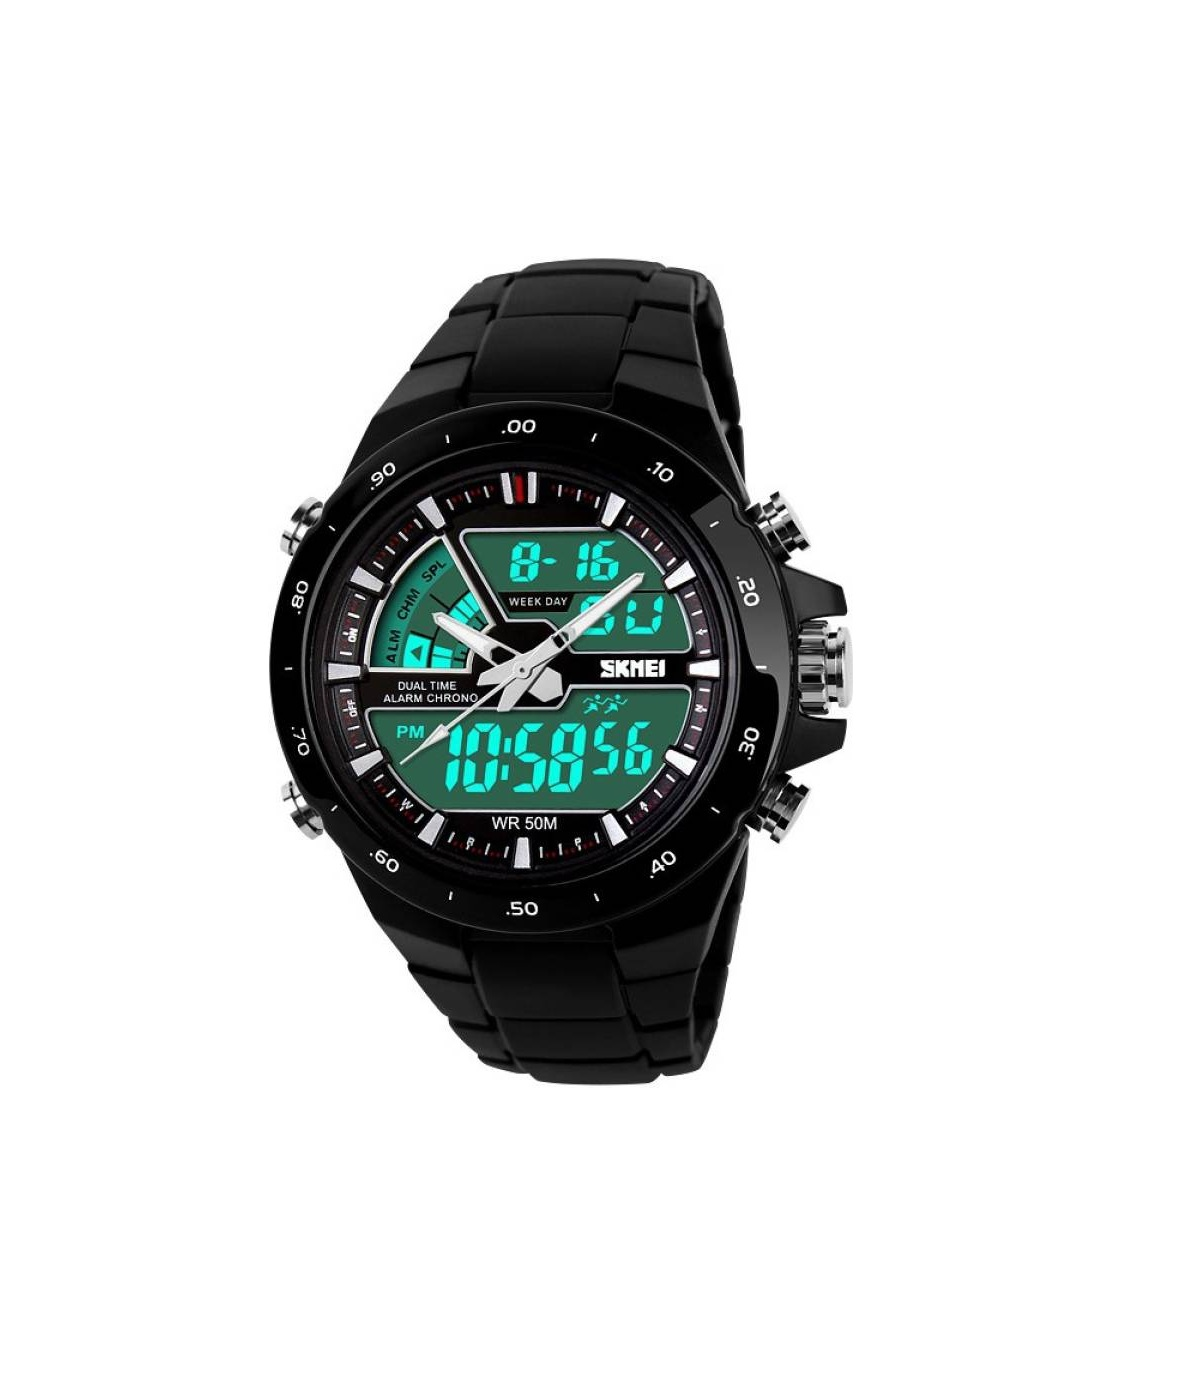 Skmei Black Quartz Digital With Analog Latest Best Looking Sport Watch For Men ,Boys 6 month warranty